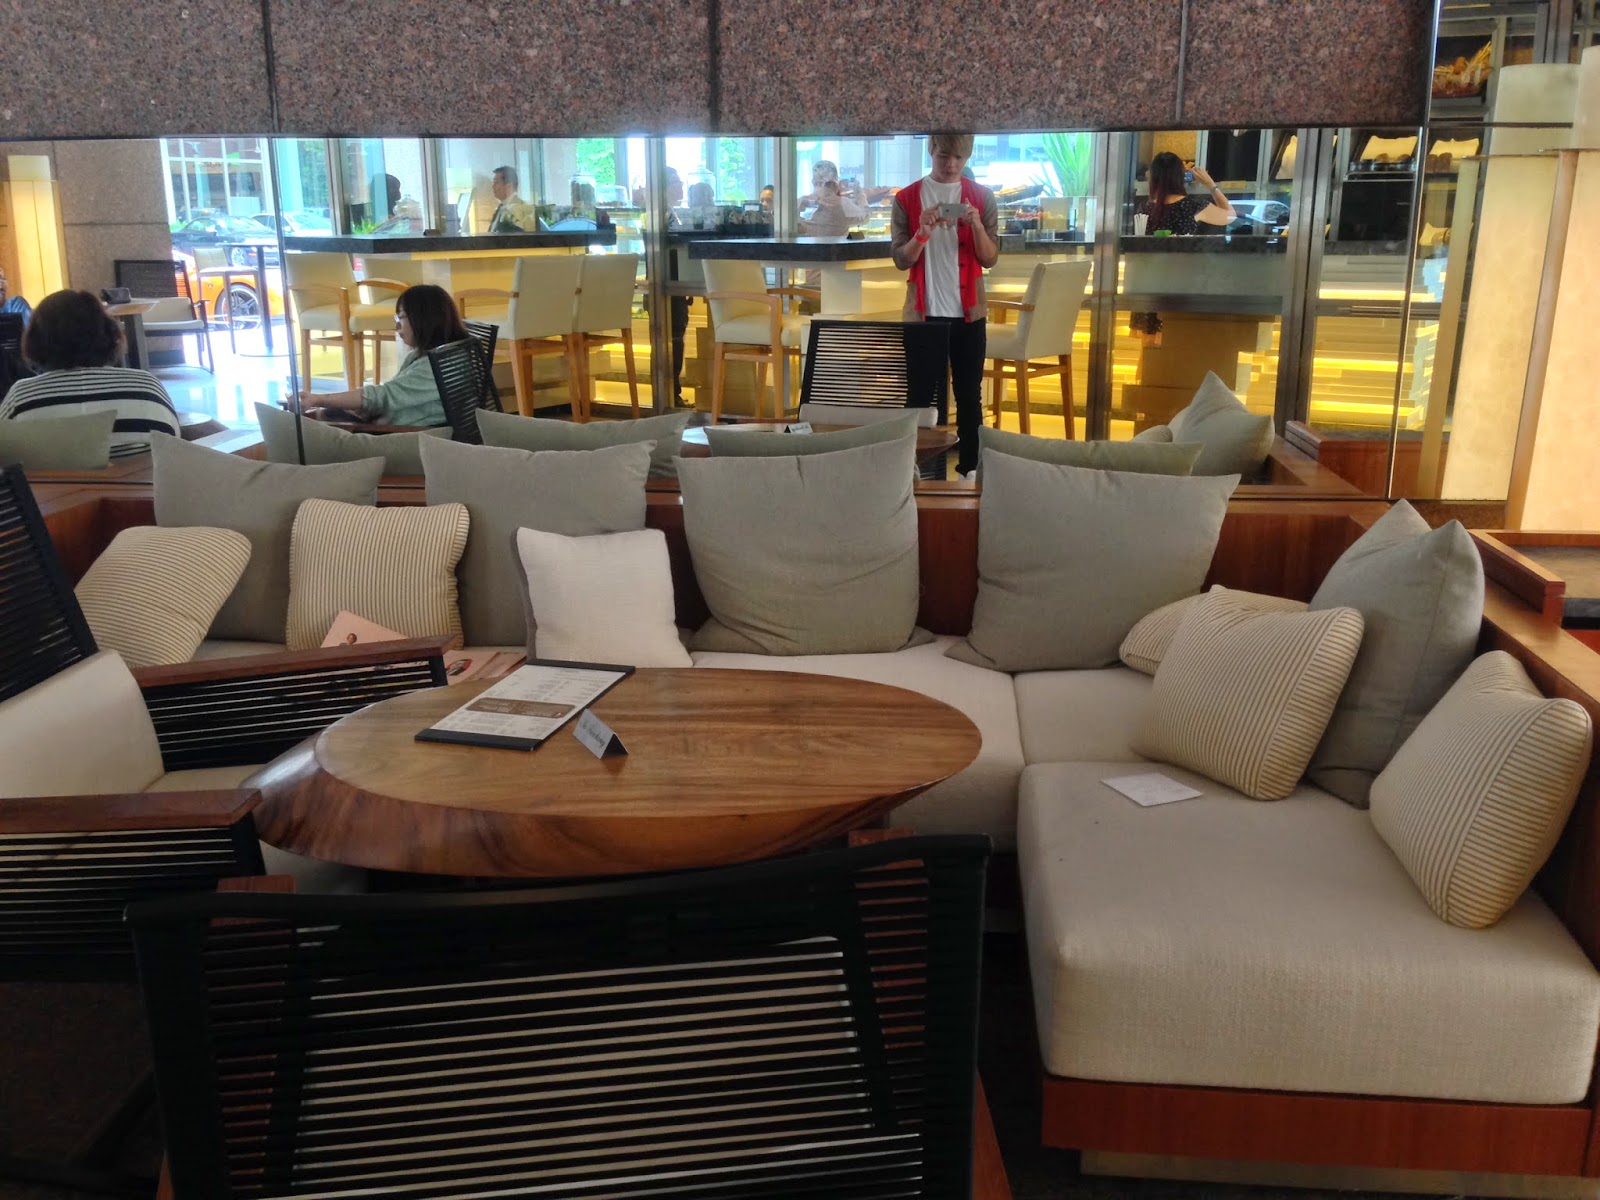 The Terrace sofa seats